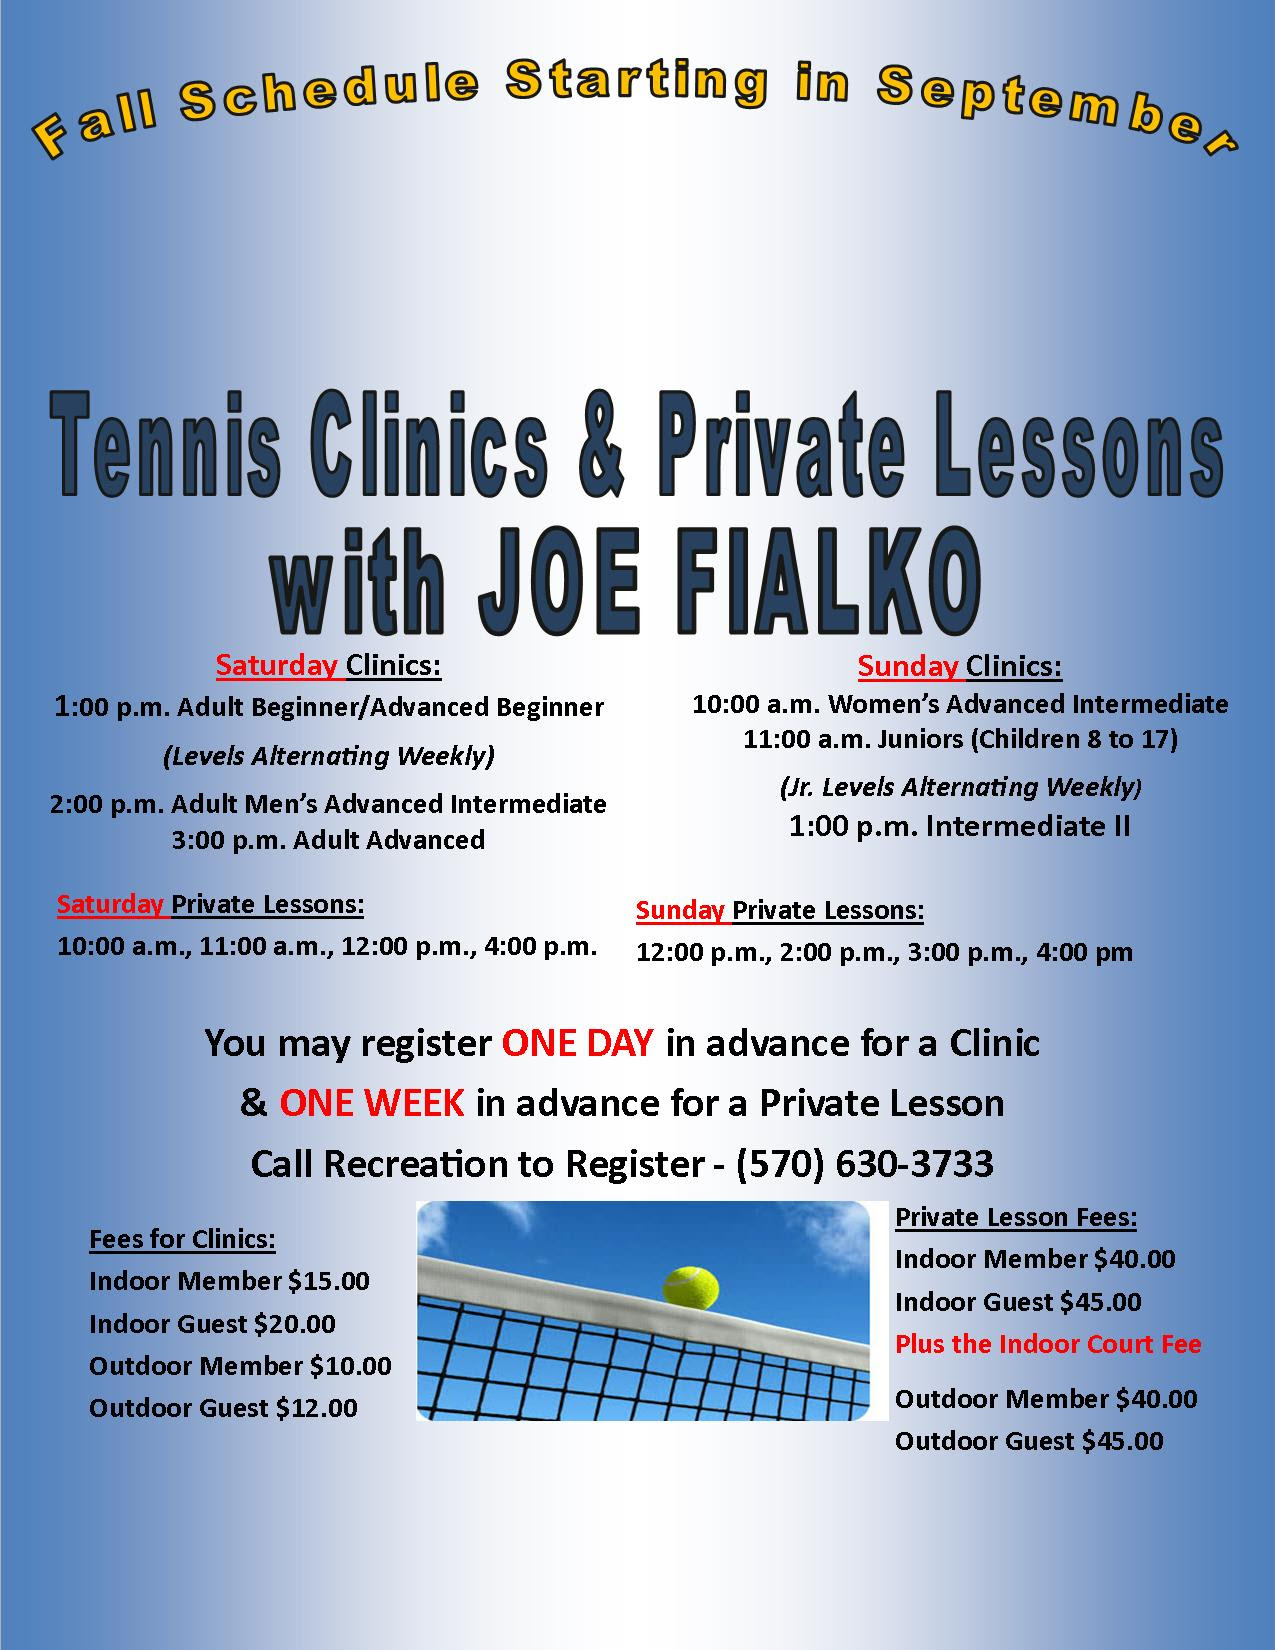 Hideout Tennis Clinics